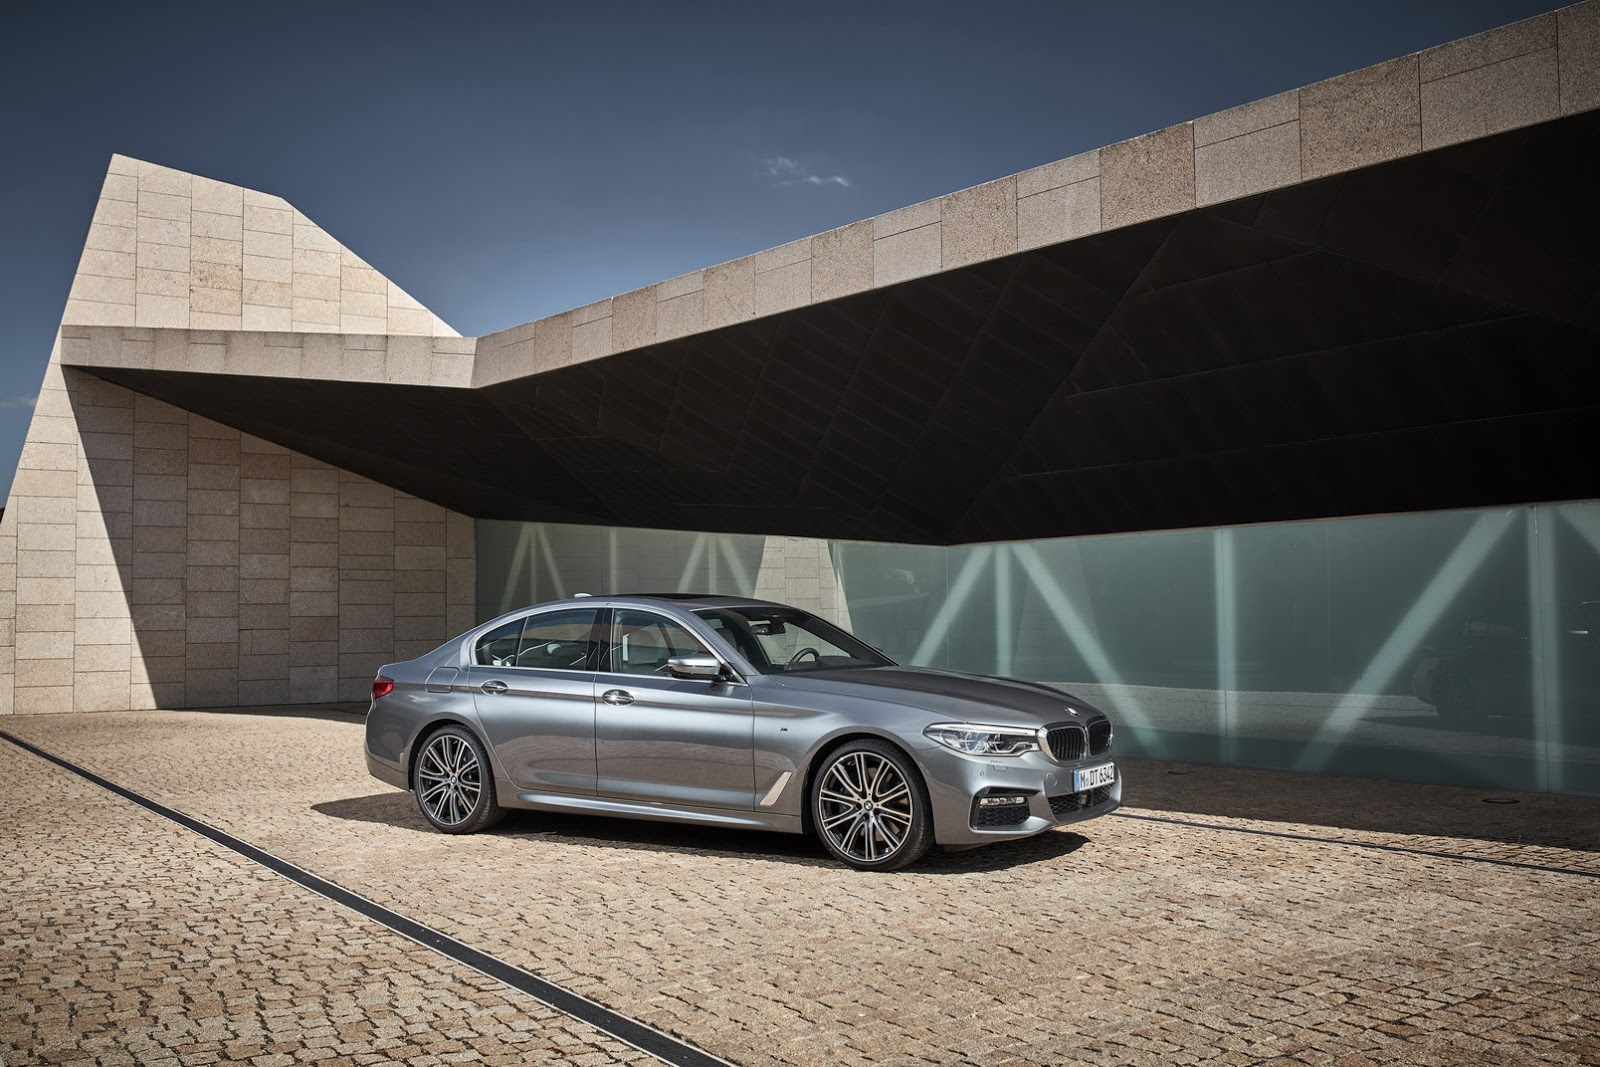 2017-BMW-5-Series-29.jpg